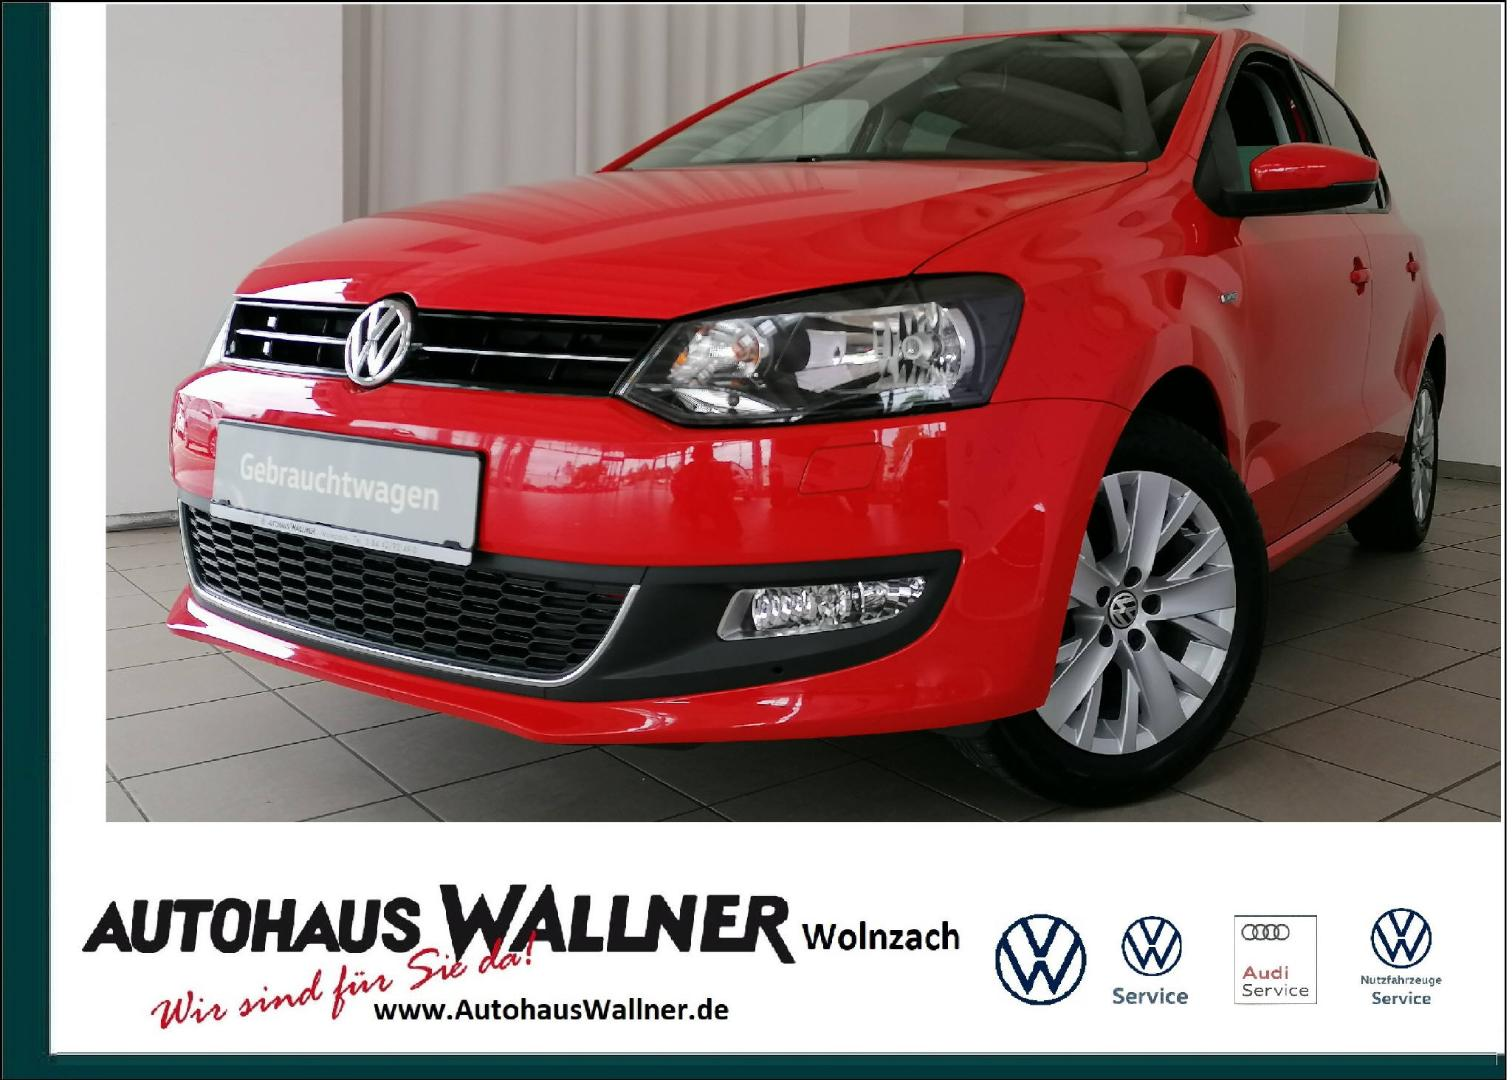 Volkswagen Polo Trendline 1.2 BMT Life, Jahr 2013, Benzin